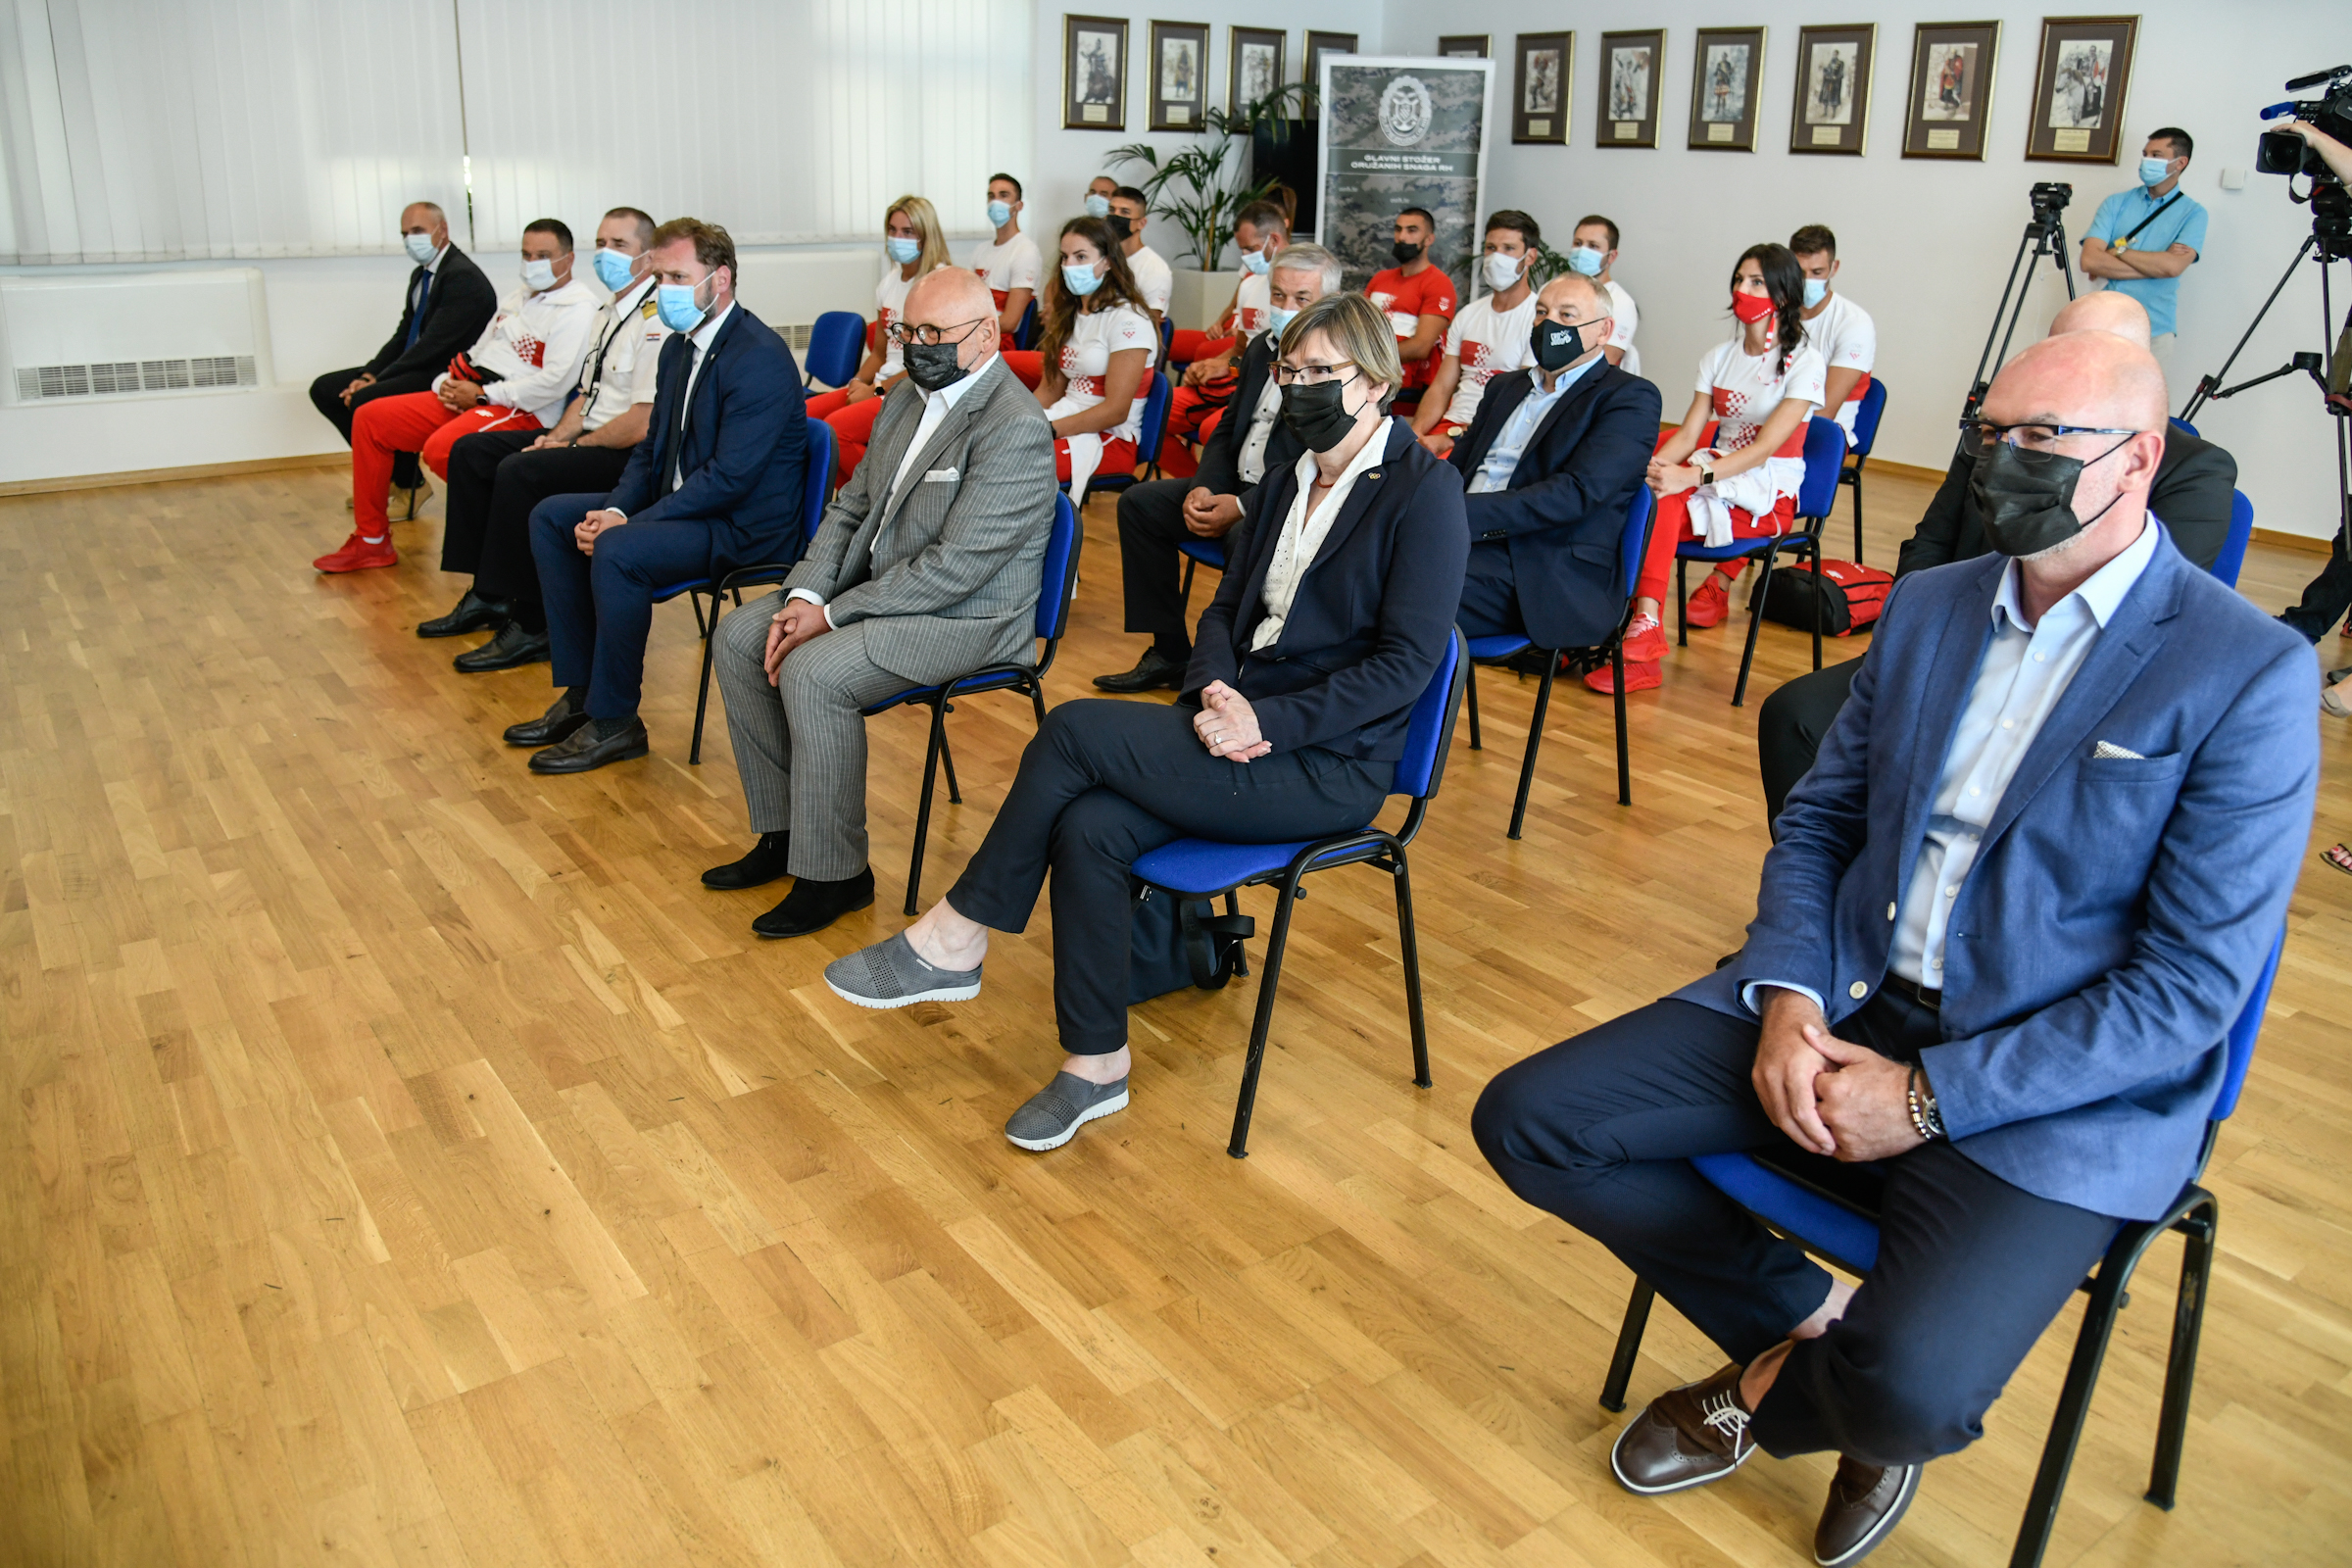 Ministar Banožić primio vrhunske sportaše uoči odlaska na OI